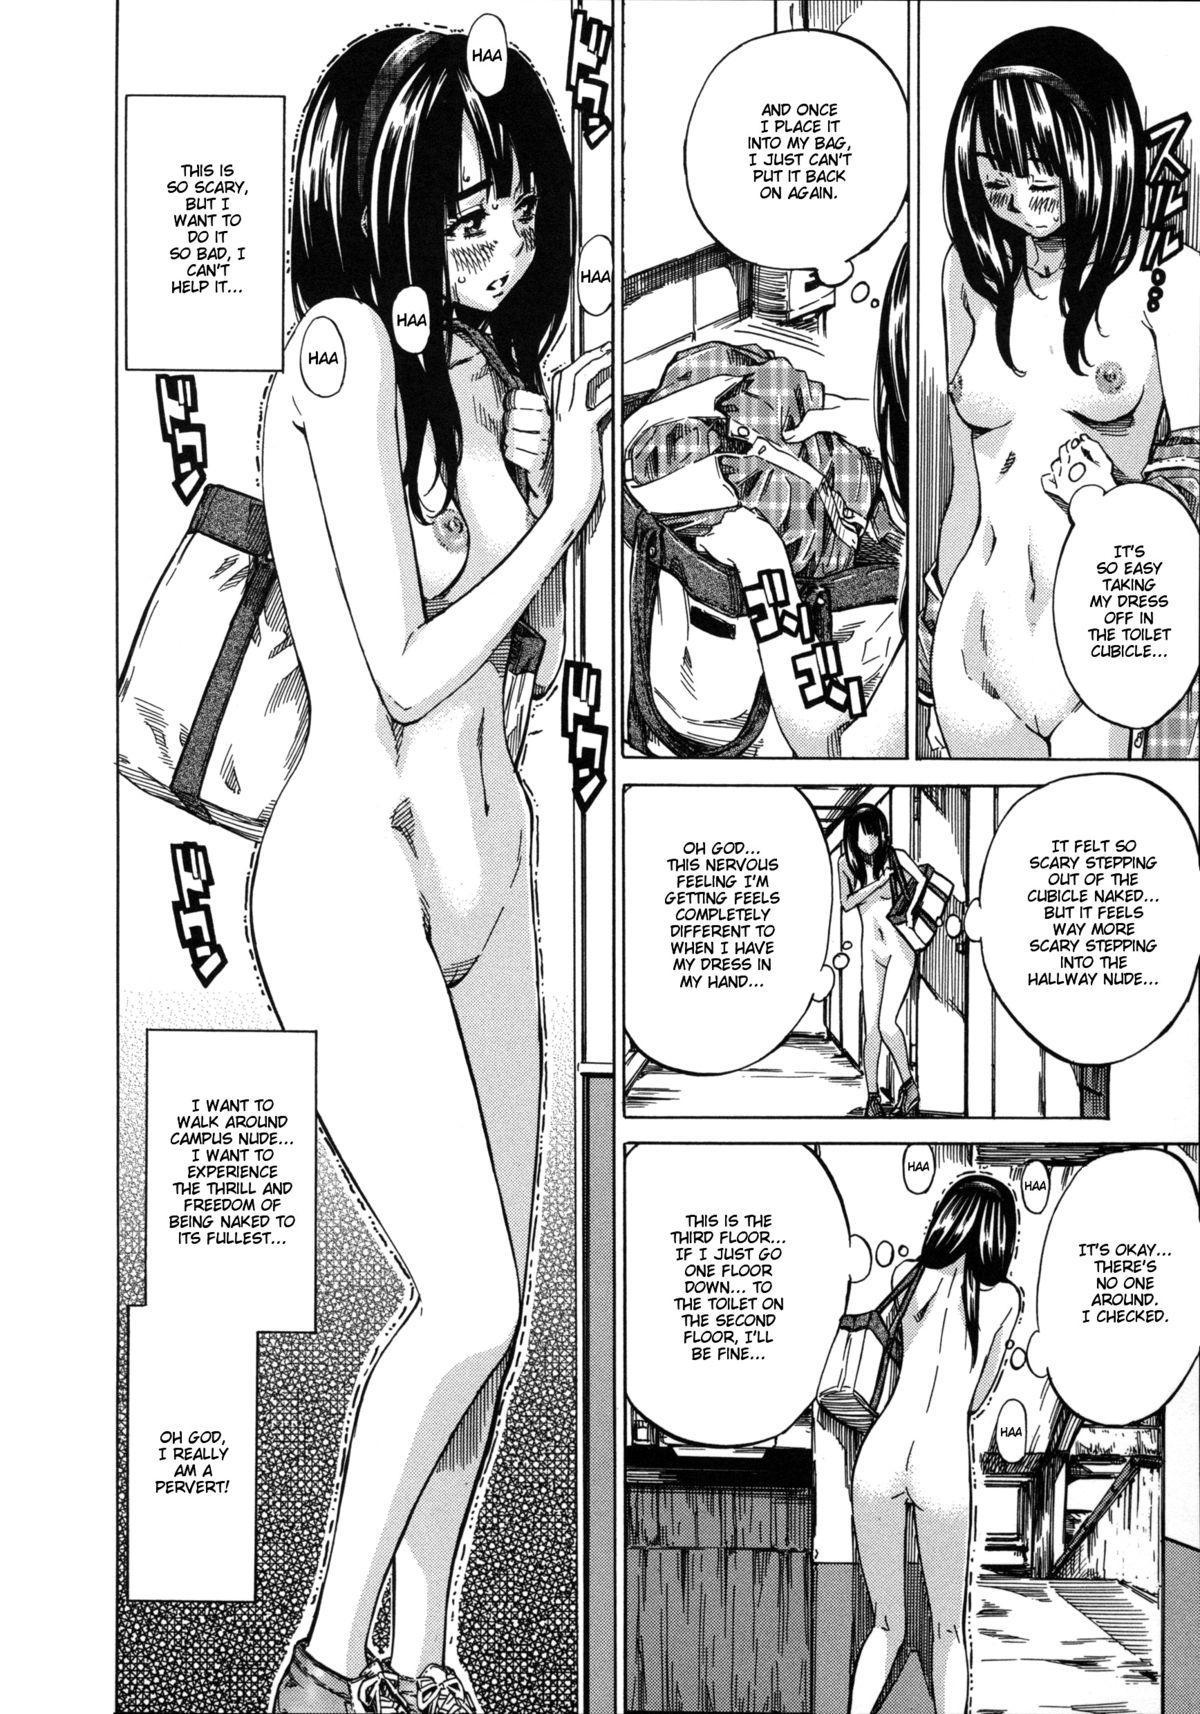 Kashiwazaki Miki wa Ironna Basho de Zenra Sanpo Shitemita   Miki Kashiwazaki Goes Naked in All Sorts of Places Ch. 1-4 29